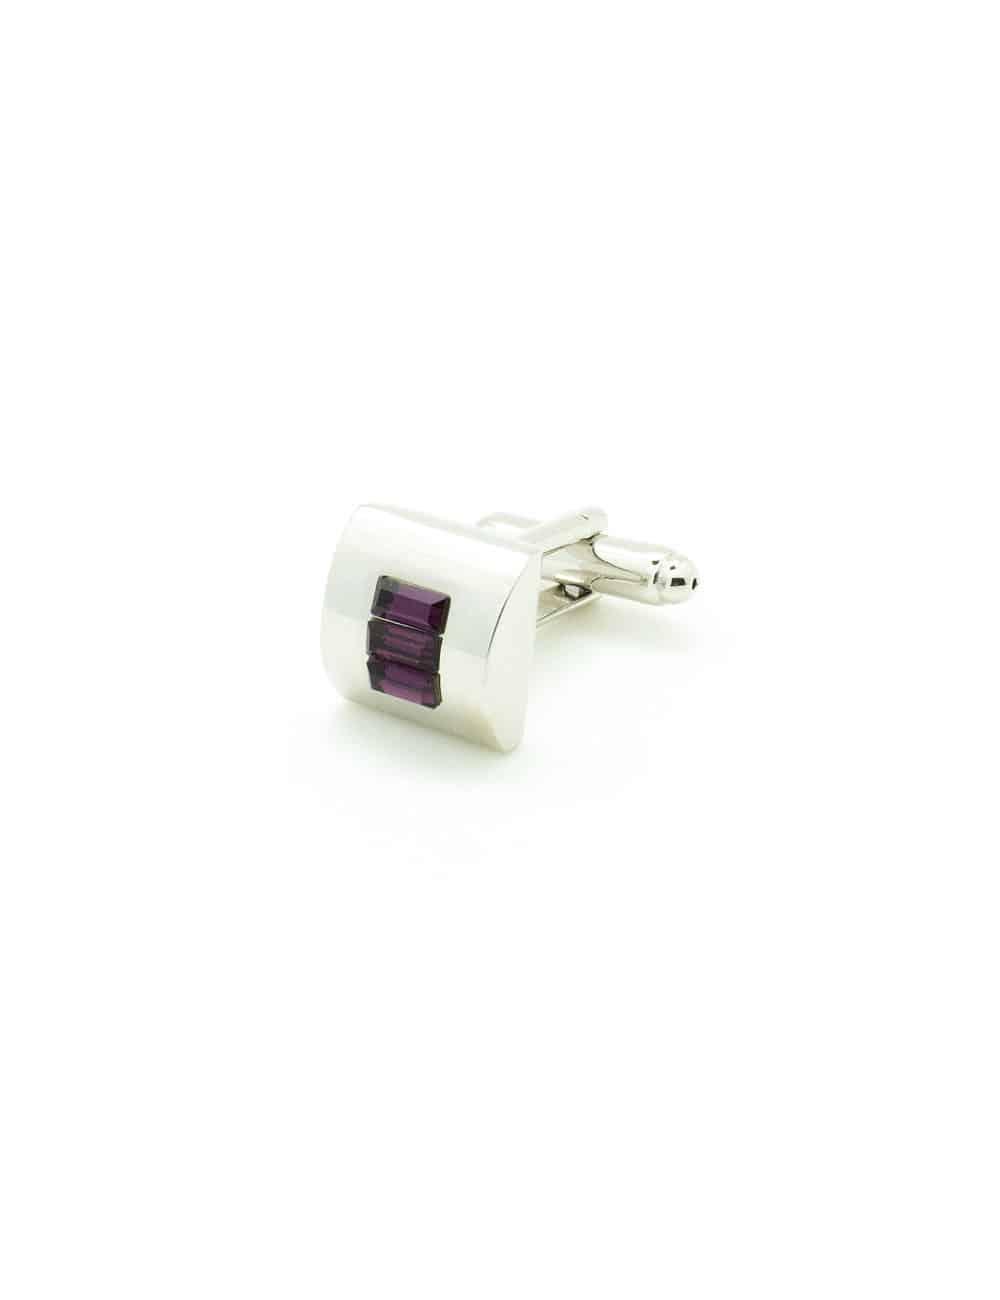 Purple Crystal Tile in Silver Semi Circle Cufflink